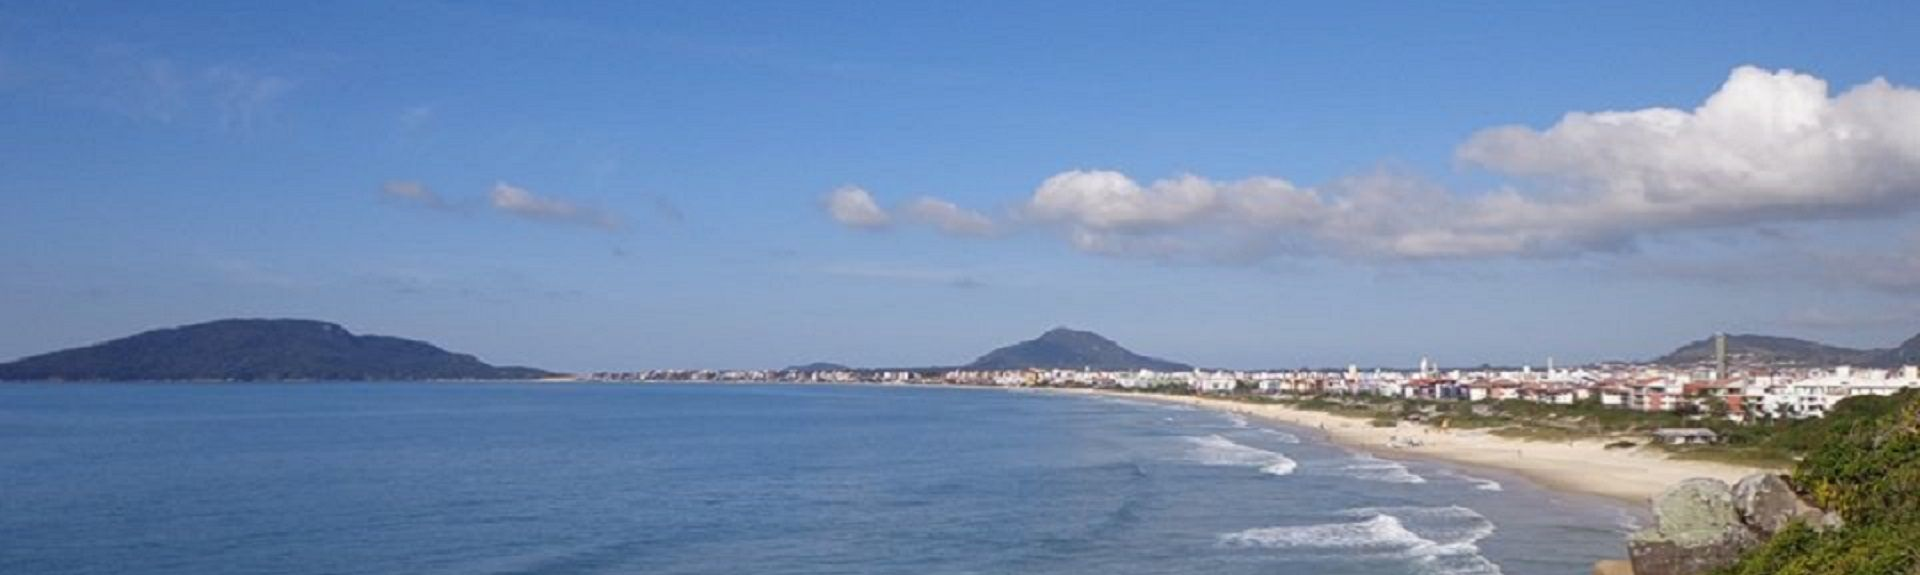 Ingleses Sul, Florianópolis, Santa Catarina, Brasil